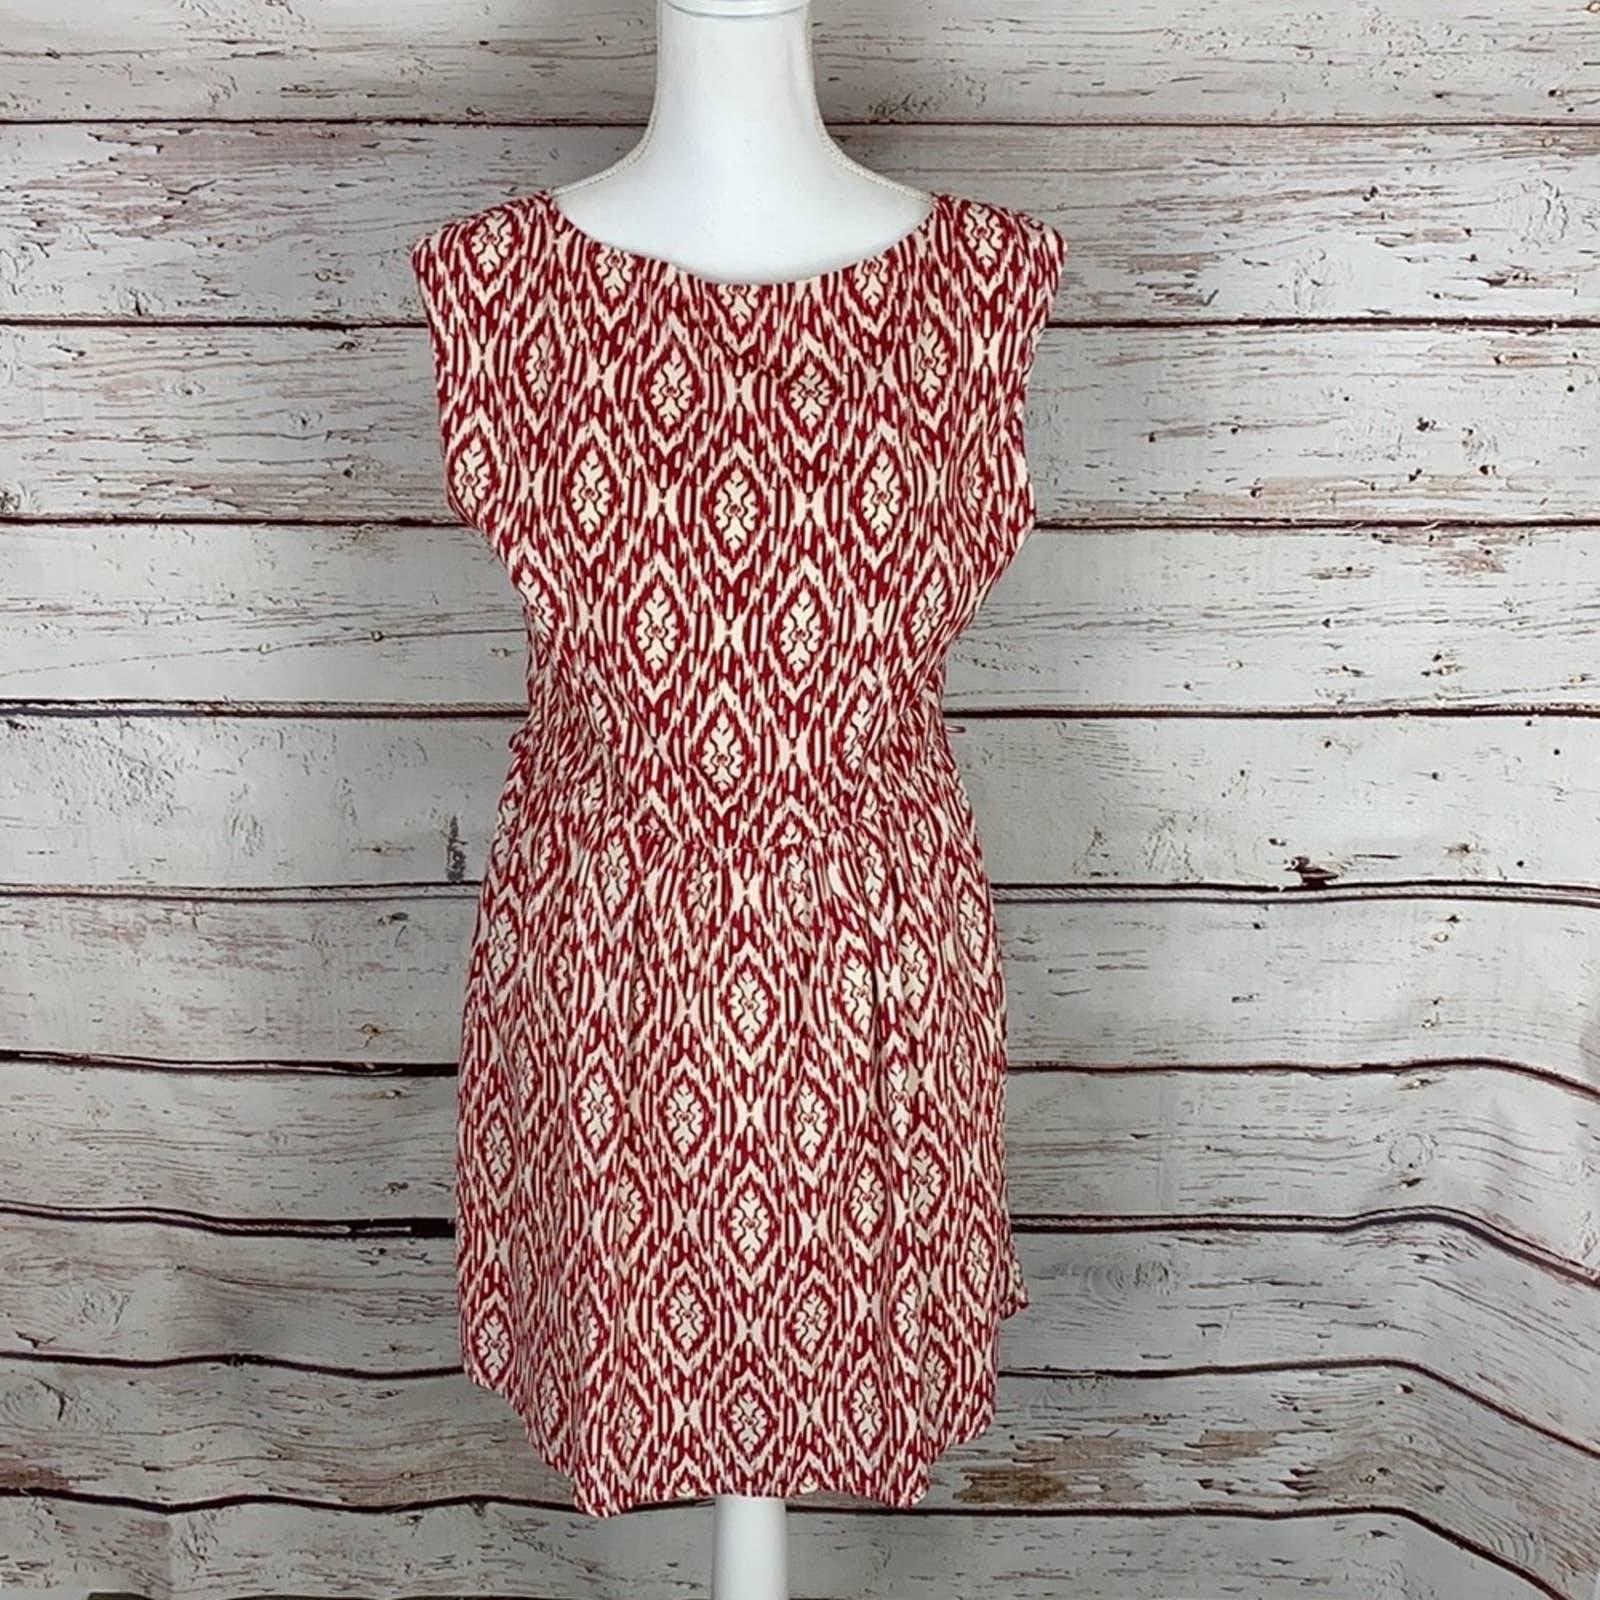 Pink Owl Apparel Red/Cream Dress L